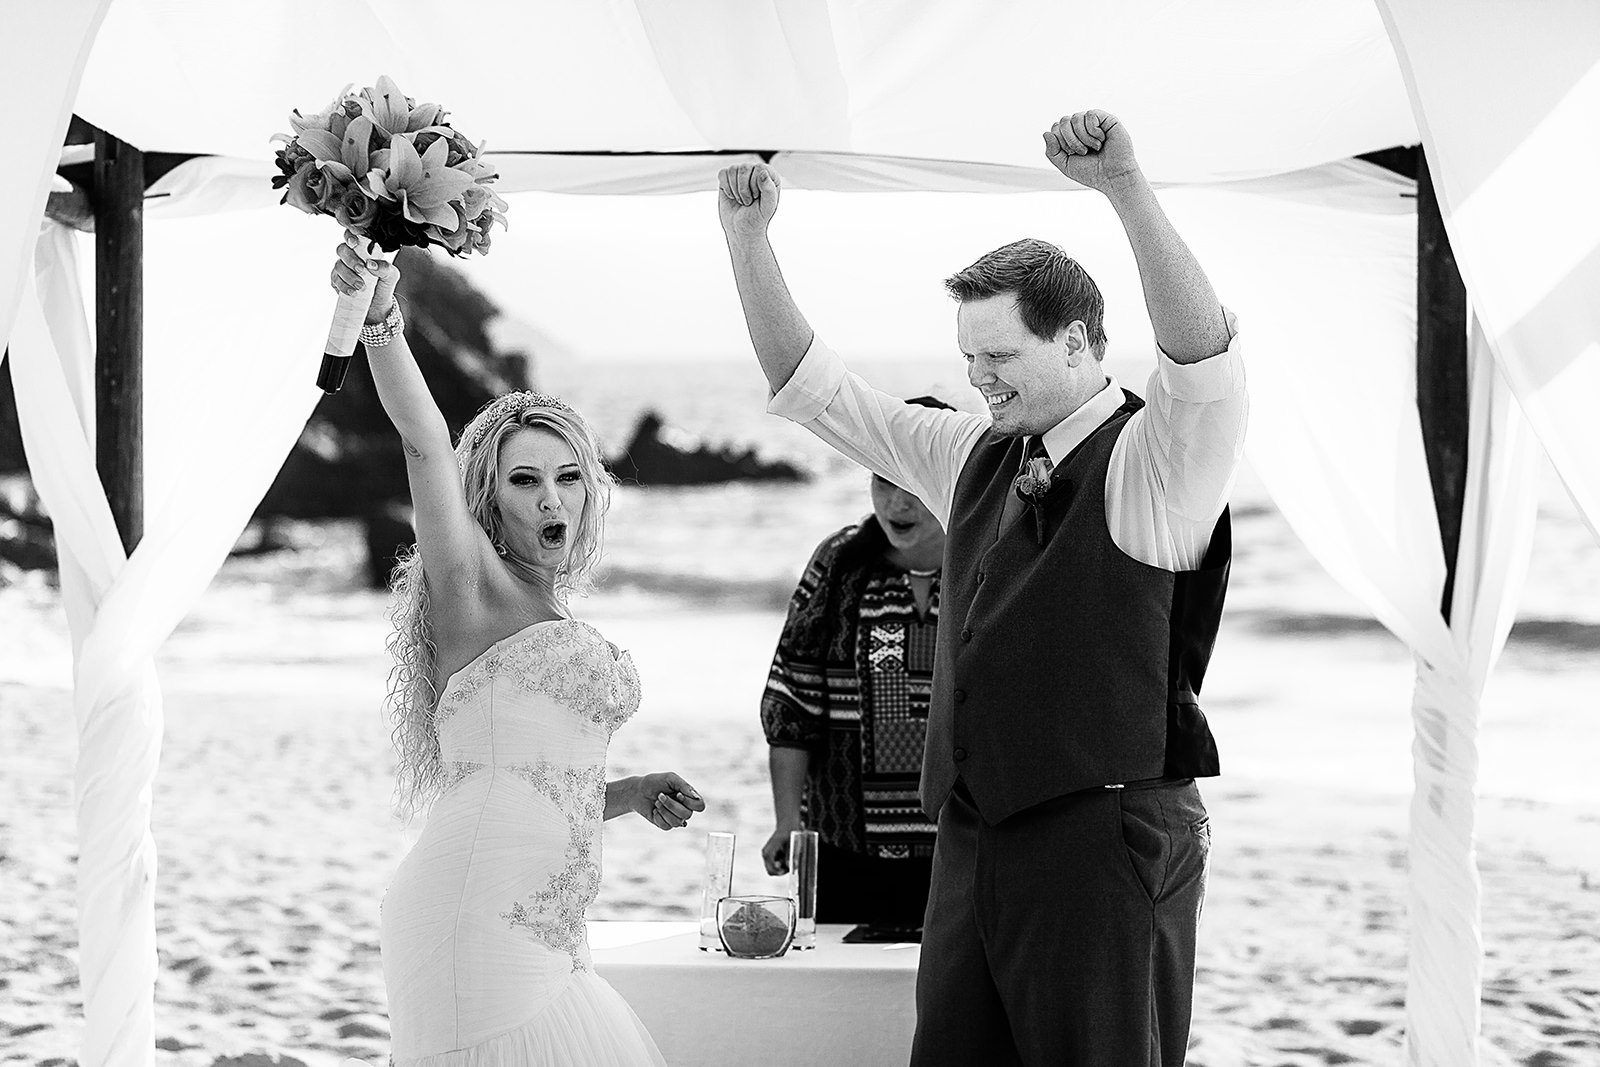 Wedding couple celebrates at ceremony on beach, black and white moment